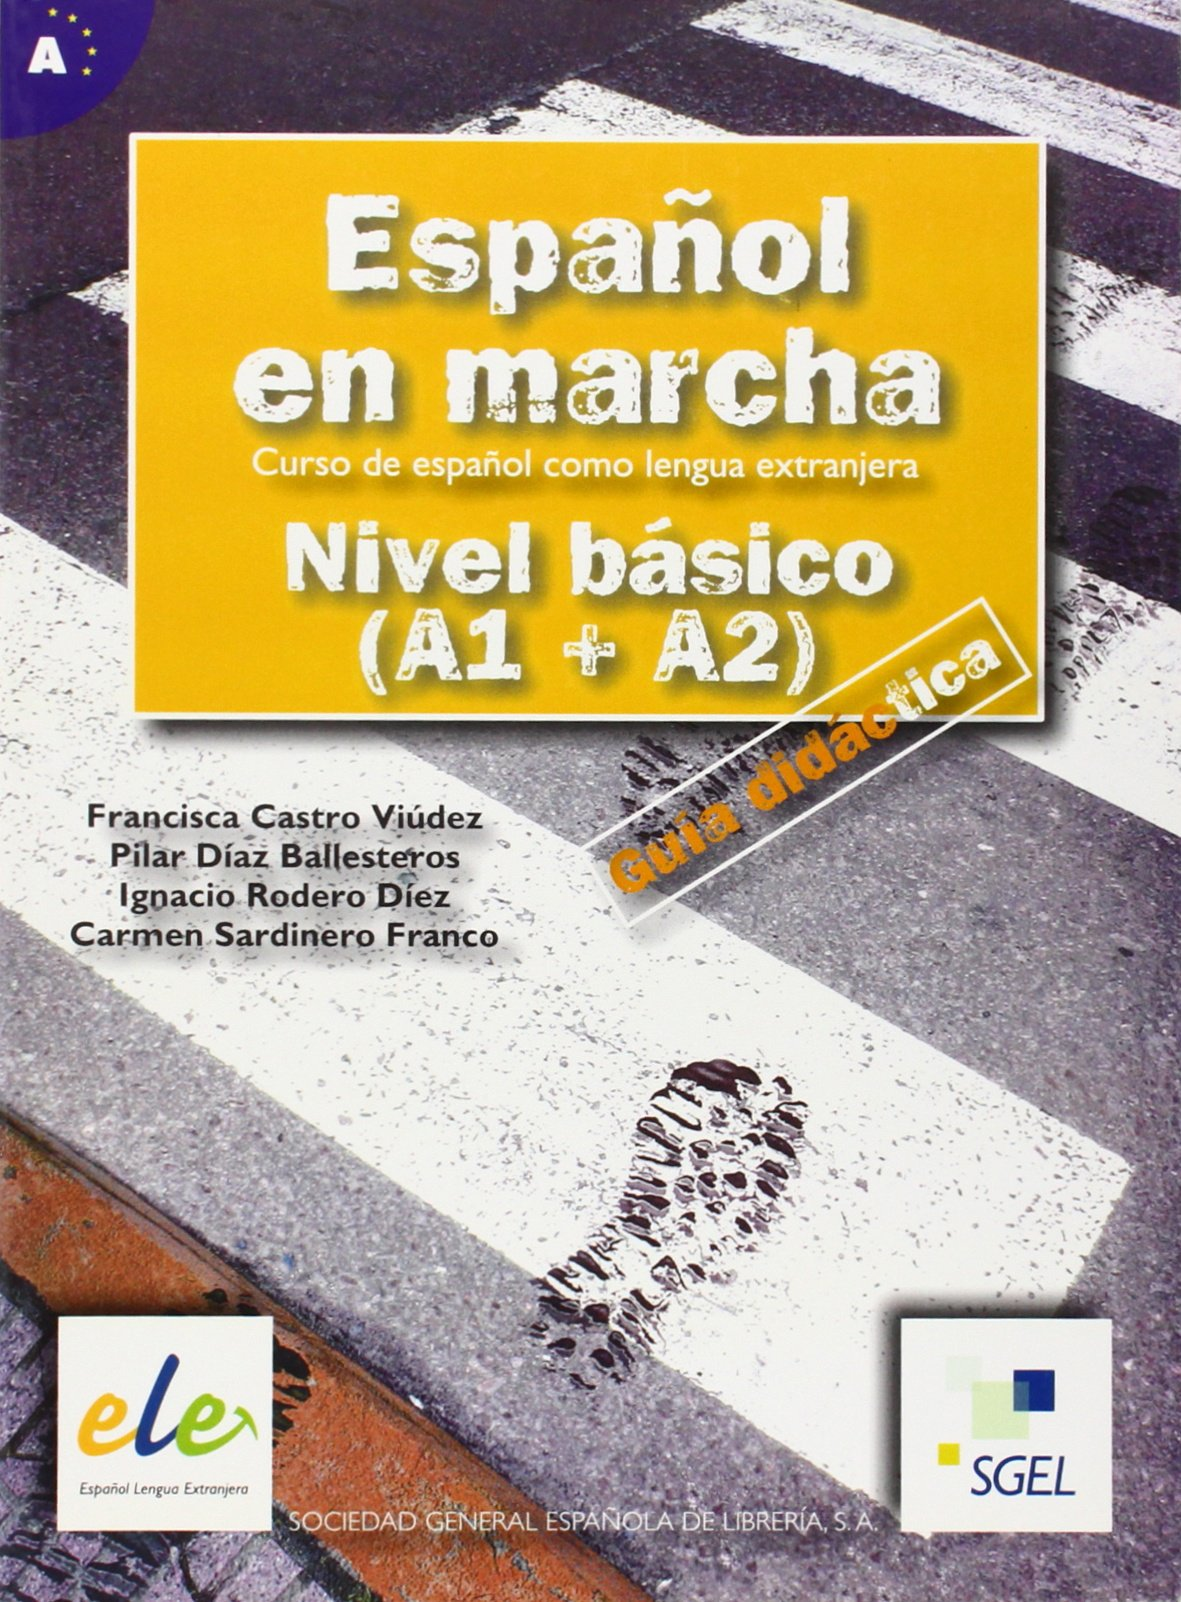 espanol-en-marcha-basico-guia-didactica-espaol-en-marcha-basico-gua-didctica-curso-de-espaol-como-lengua-extranjera-nivel-a1-a2-nivel-basico